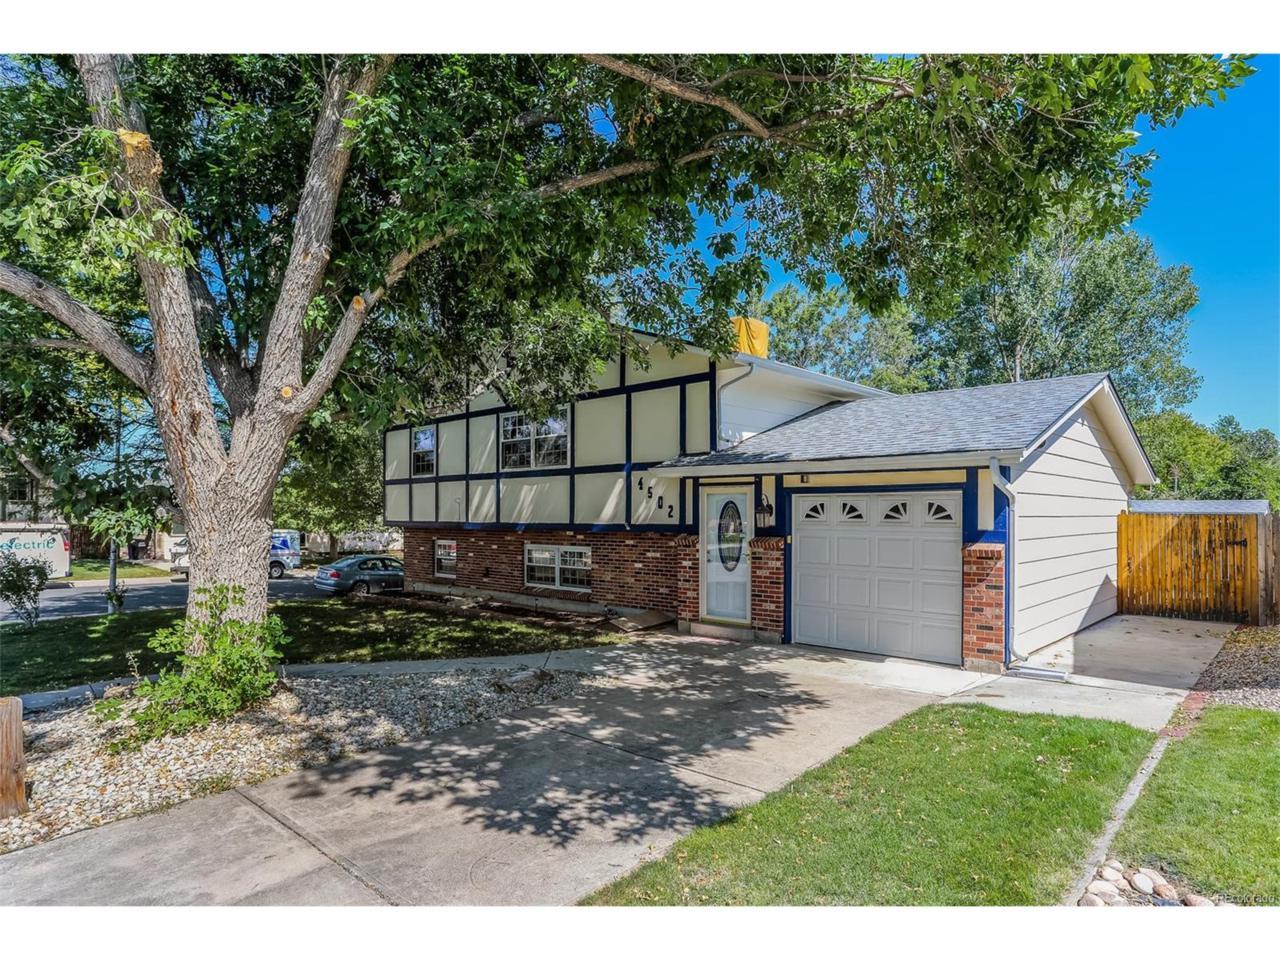 4502 S Hoyt Street, Littleton, CO 80123 (MLS #3004616) :: 8z Real Estate